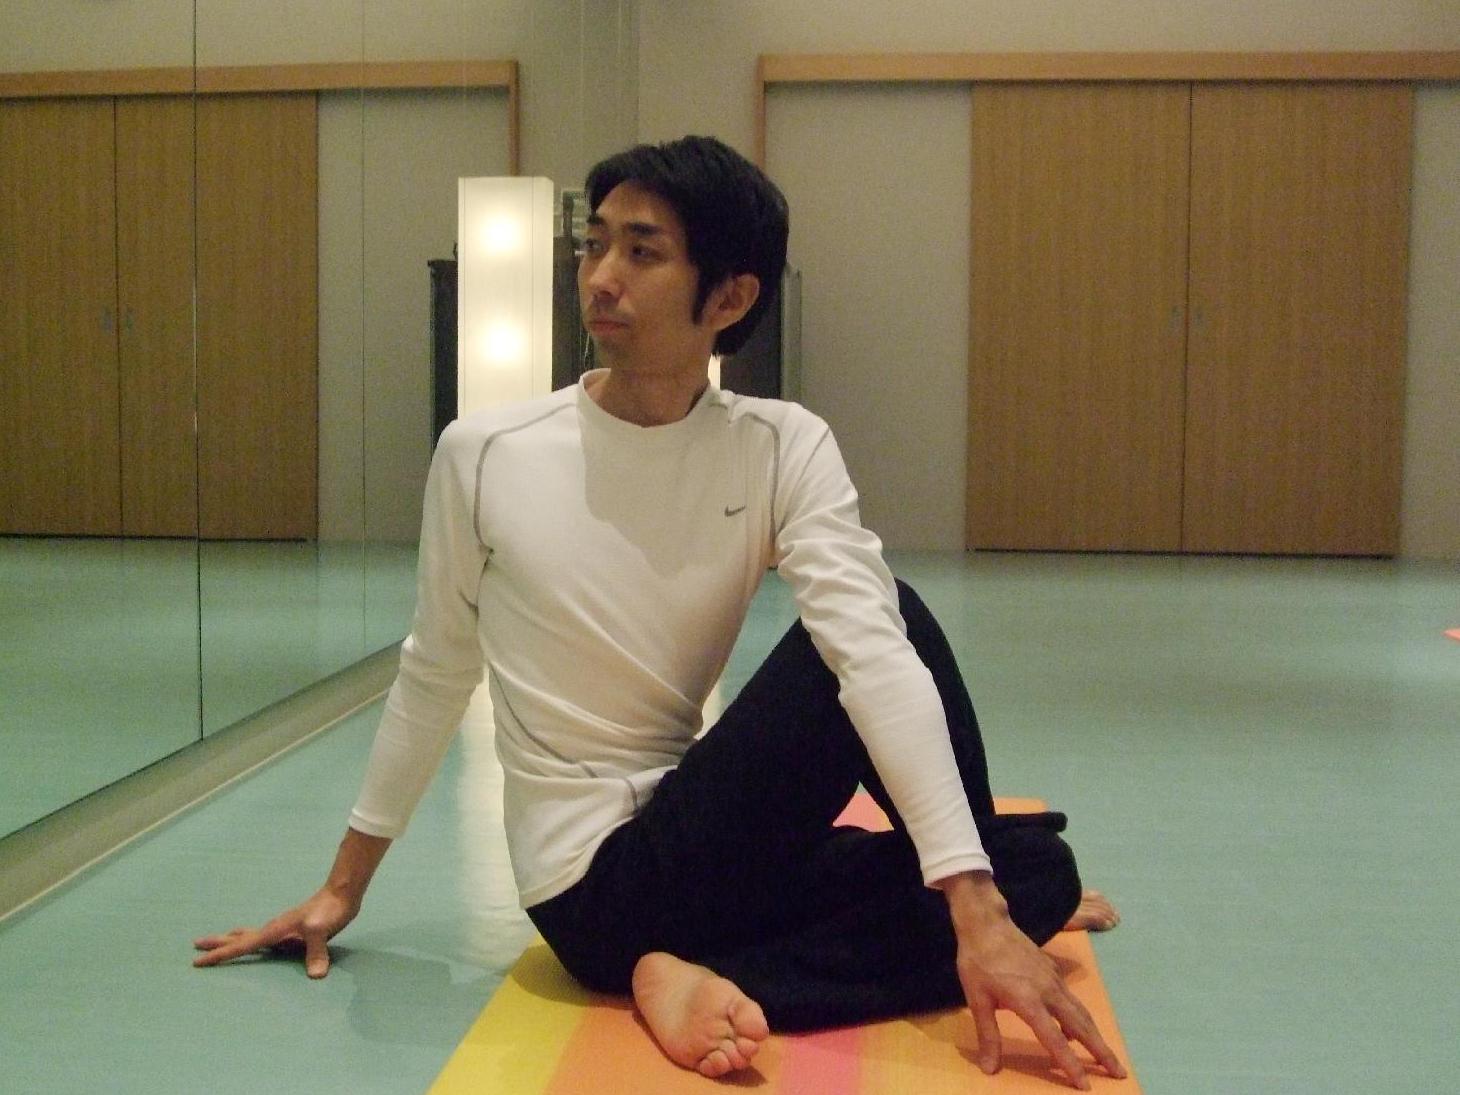 esty yoga(エスティヨガ) - 日比(ヒビ)さんの写真